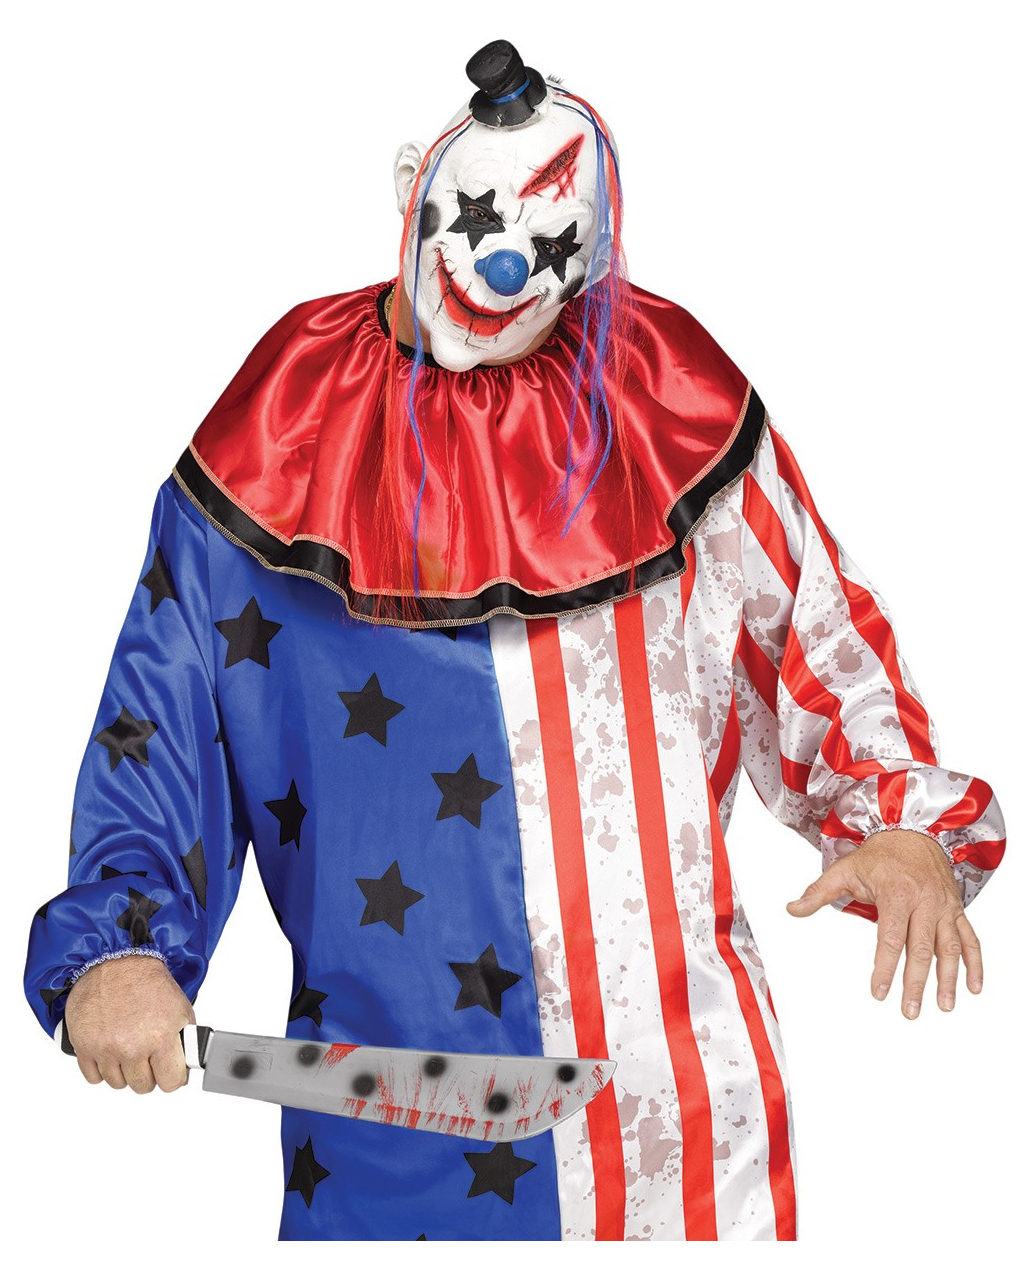 Halloween Kostume Amerika.Amerika Clown Kostum Mit Maske Plus Size